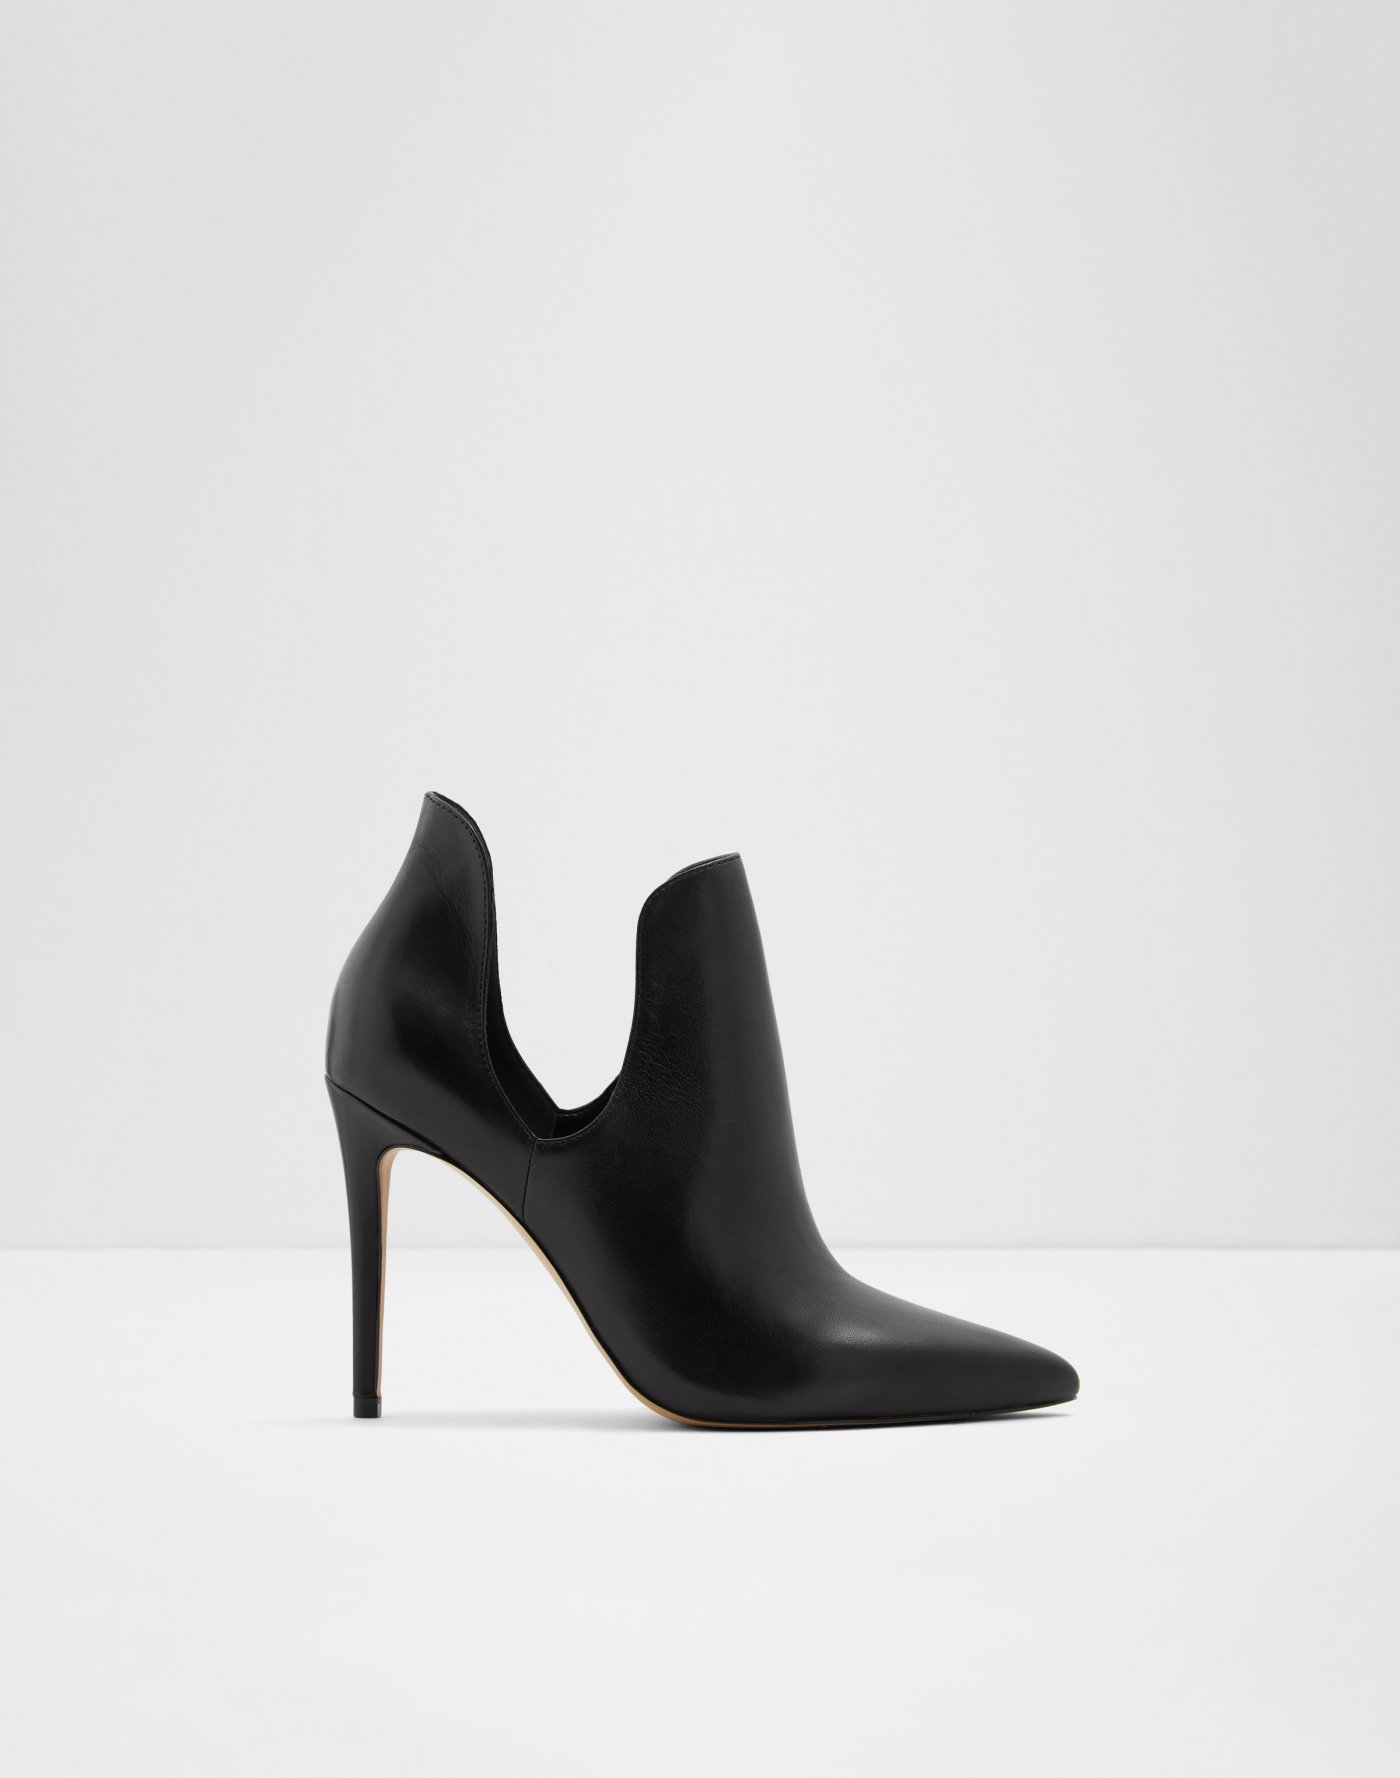 b7b4cd30e71a9 Women's Heels | Black, Red, Nude, Silver Heels | ALDO US | Aldoshoes.com US